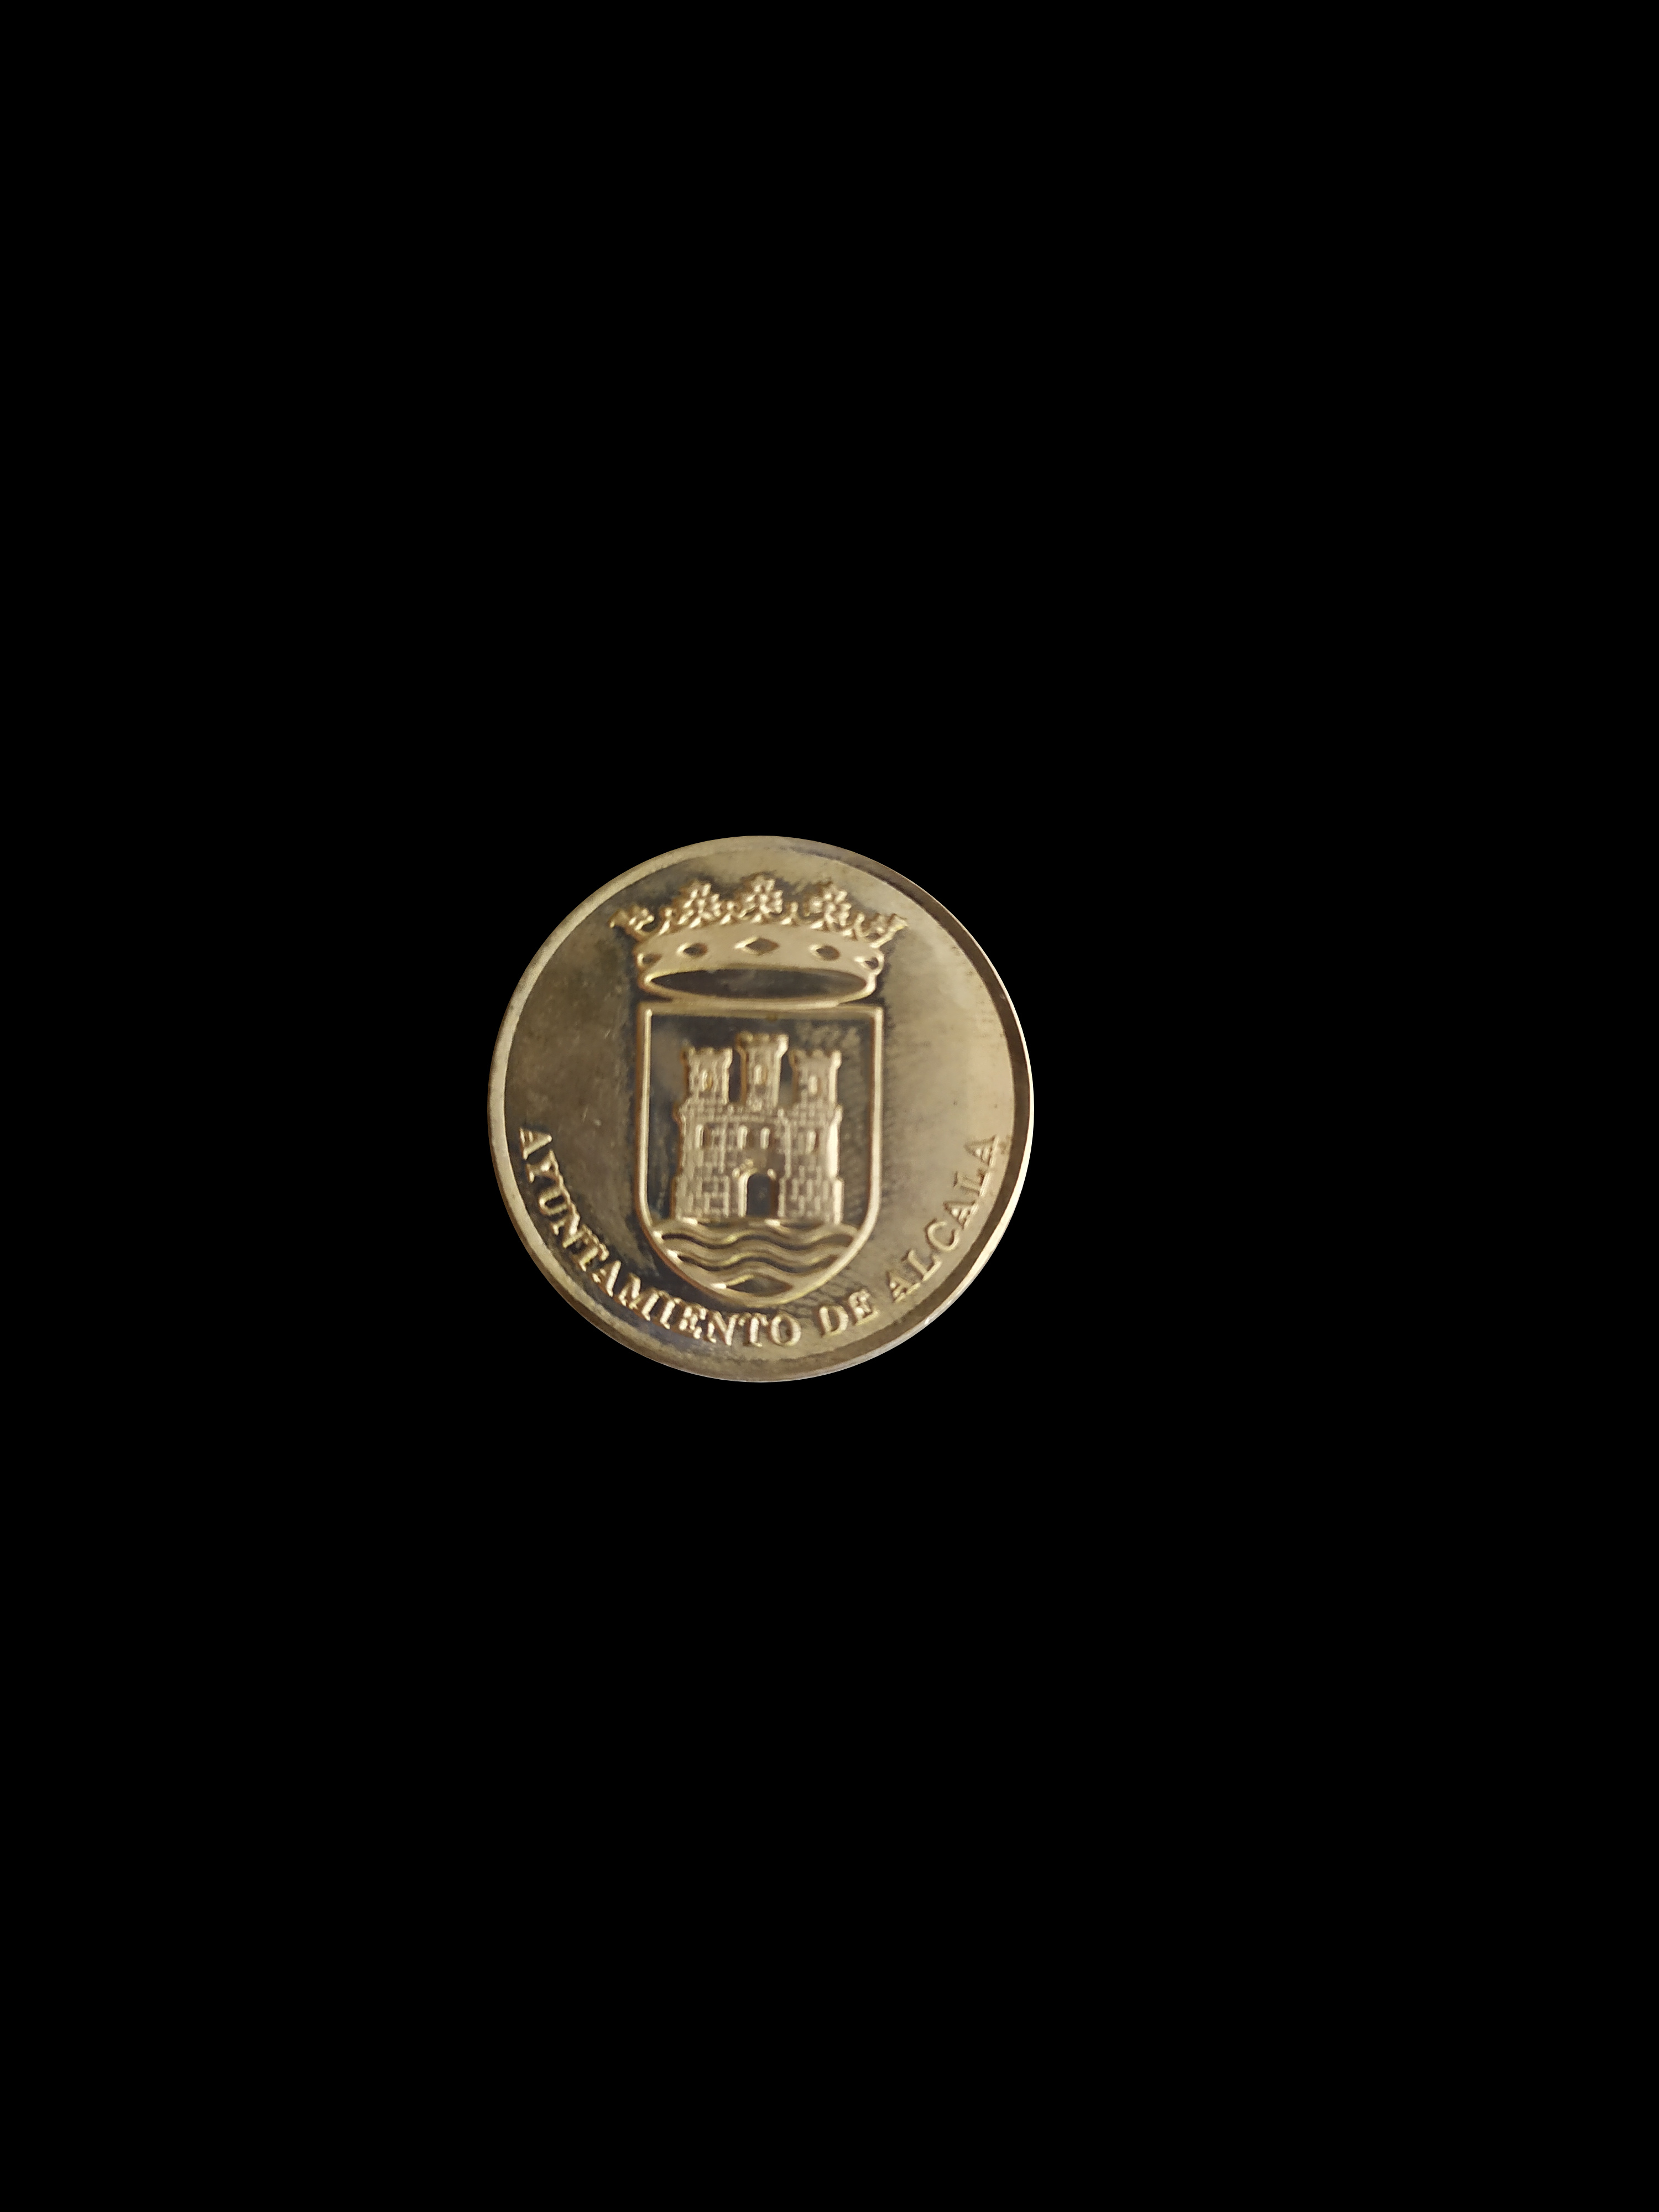 Colección de monedas de Alcalá de Henares